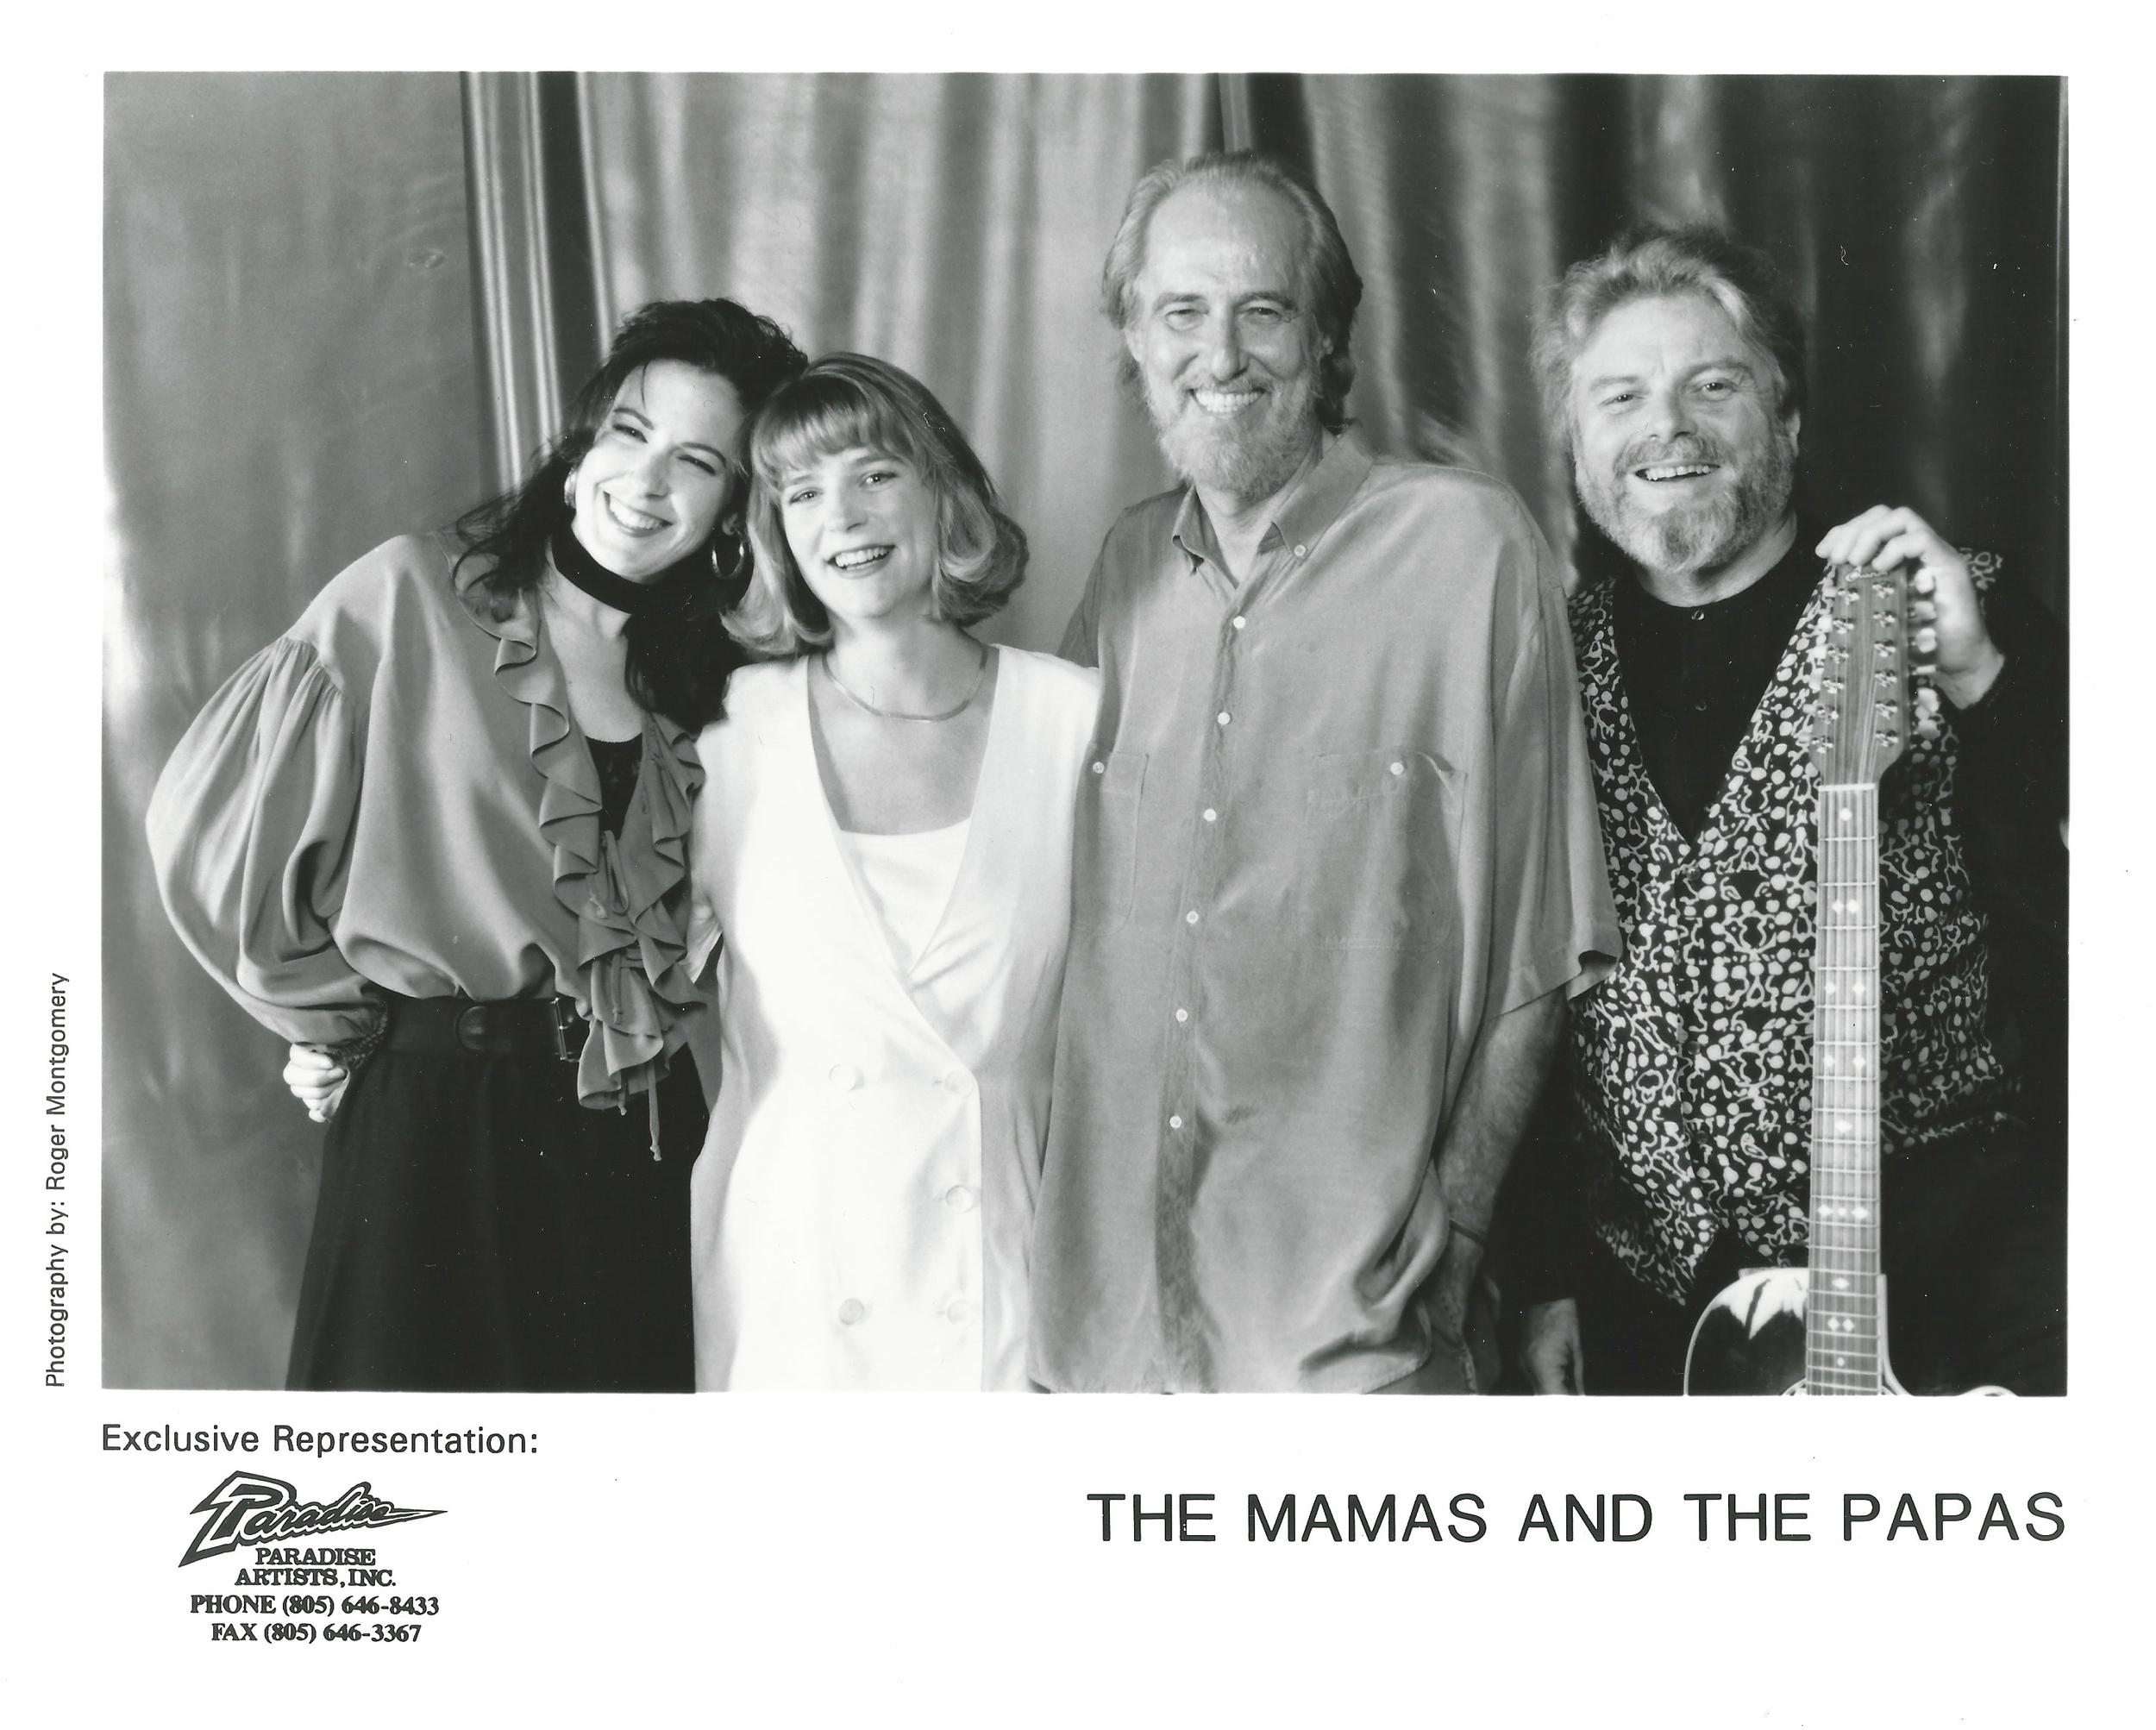 With Lisa Brescia, John Phillips and Scott McKenzie.  The Mamas & The Papas